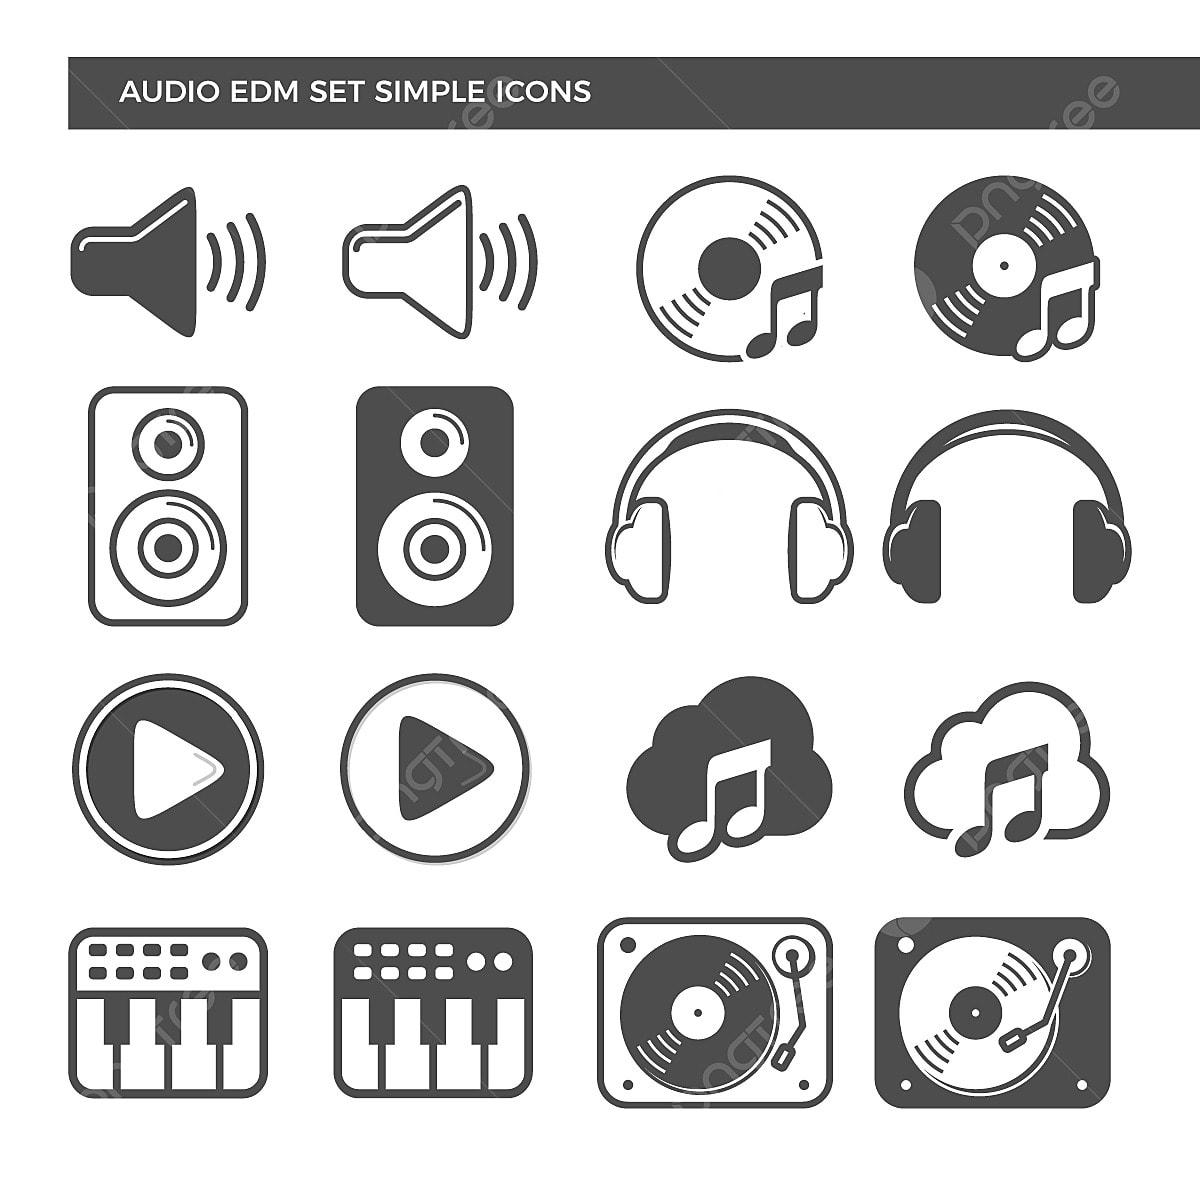 Electronic Dance Music Audio Set Icons, Dj, Headphone